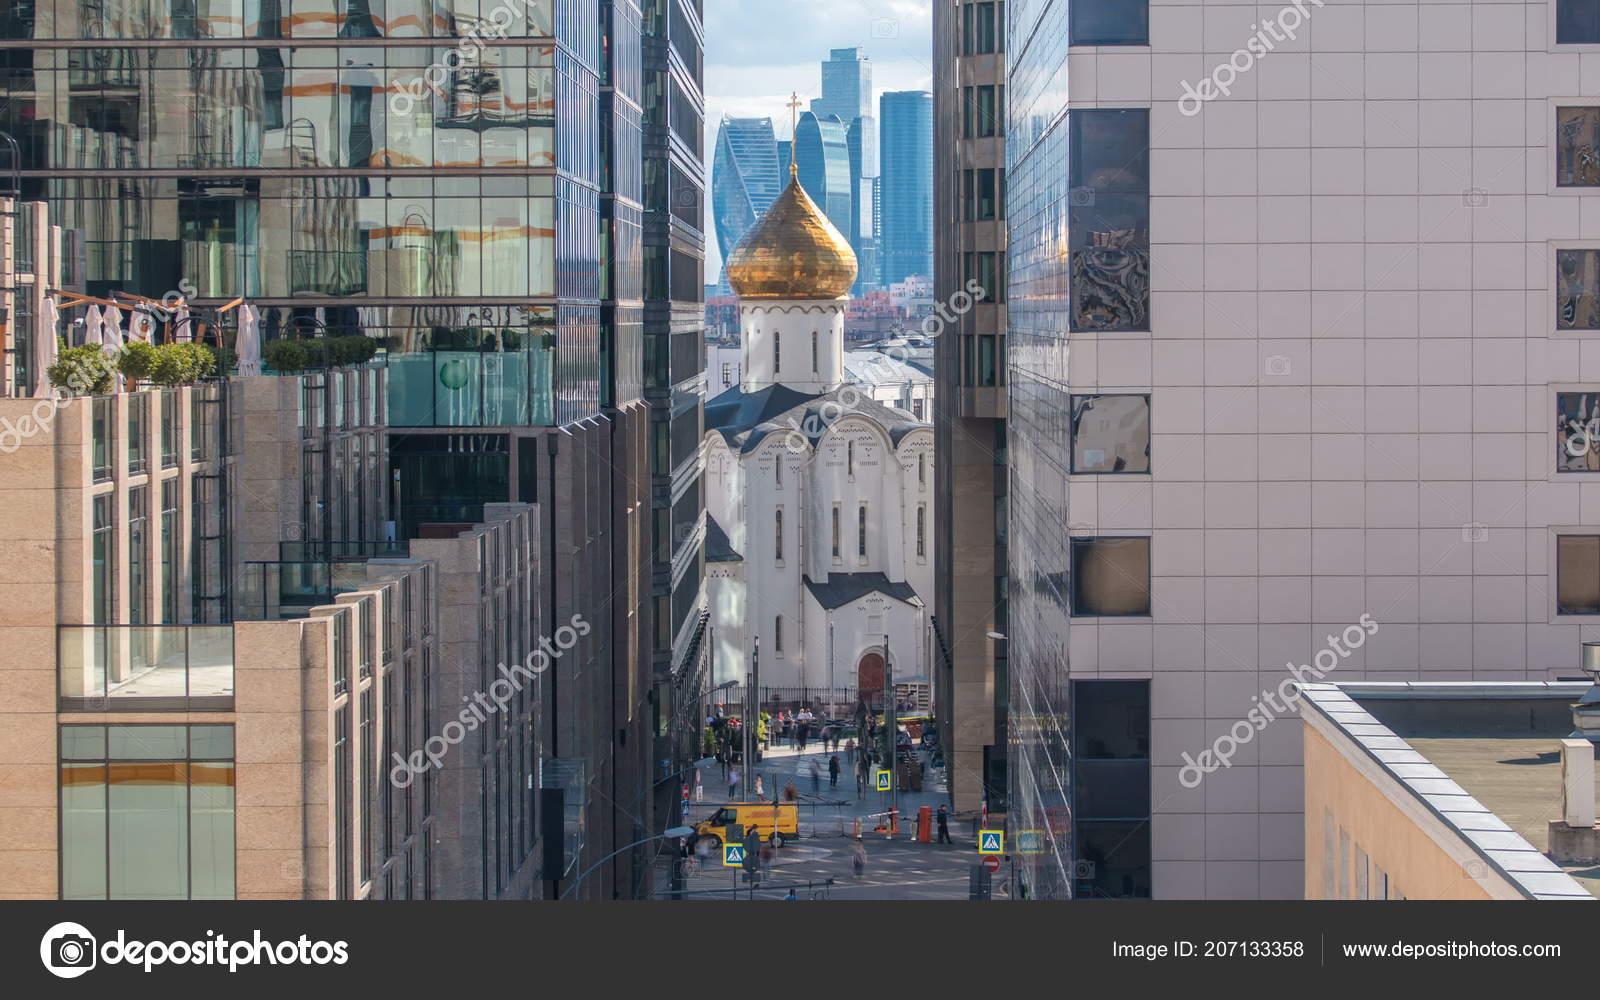 Temple Nicholas Timelapse Tverskaya Zastava Office Buildings